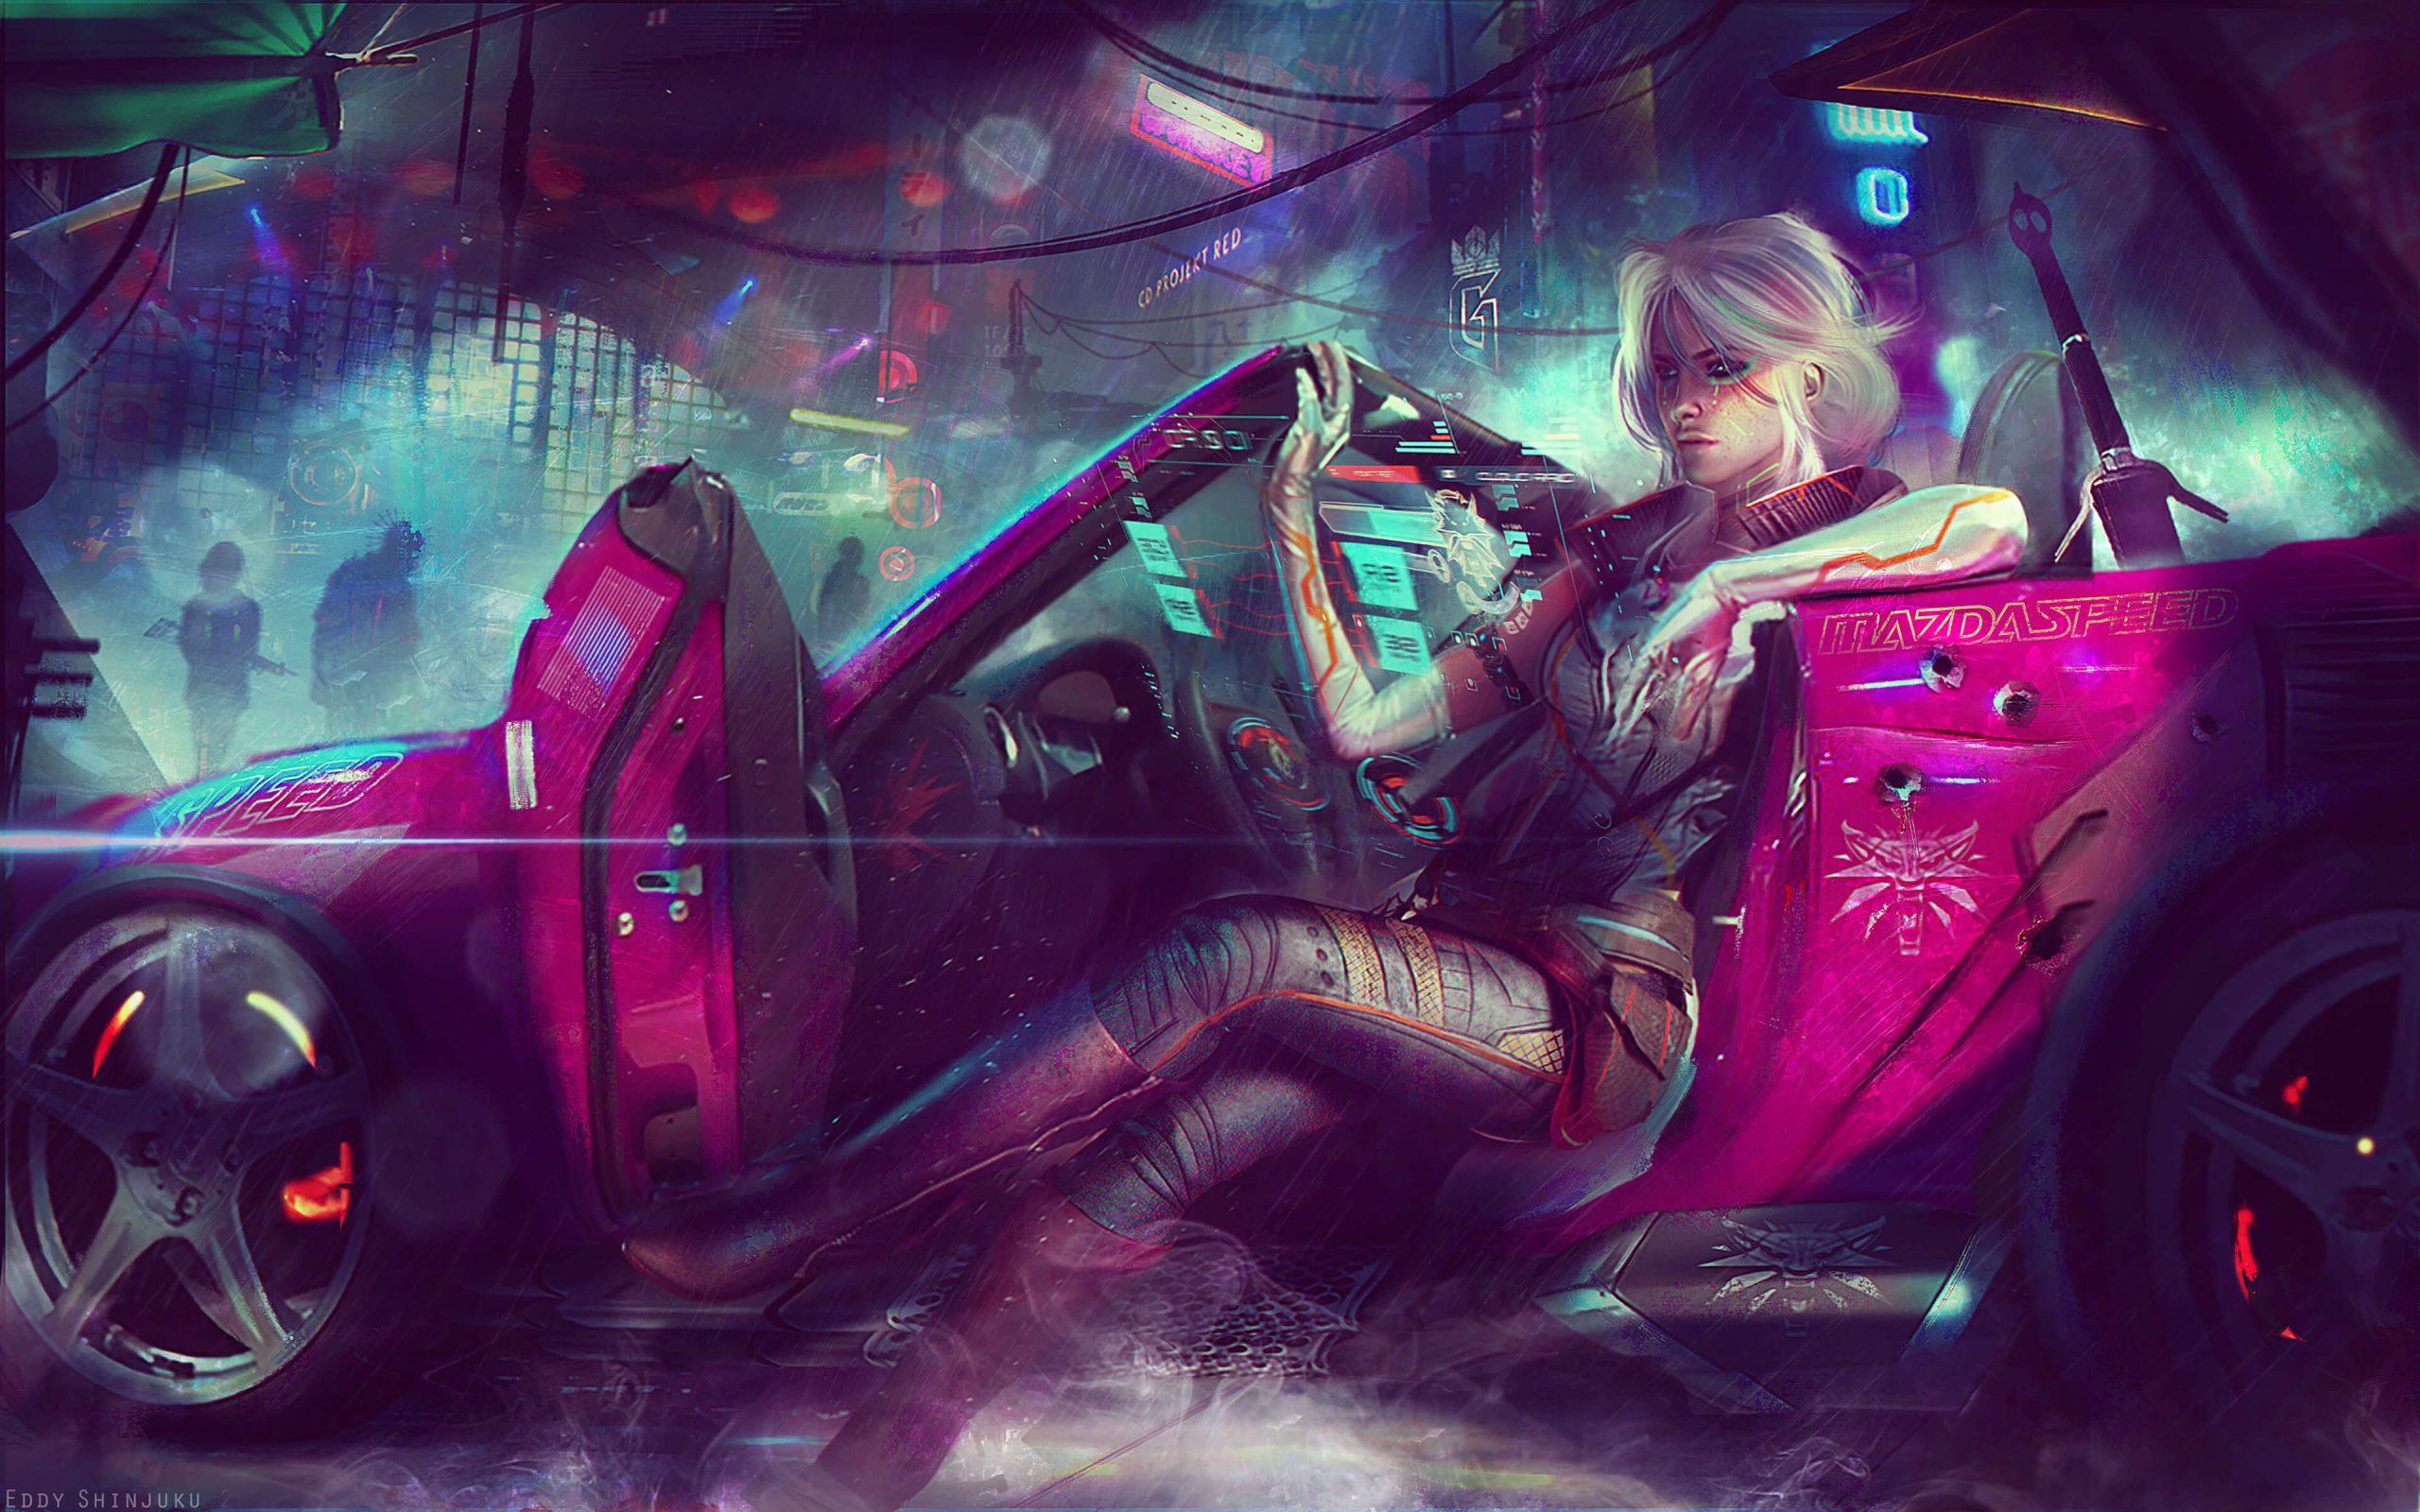 Eddy Shinjuku – CYBERPUNK 2077 Fanart